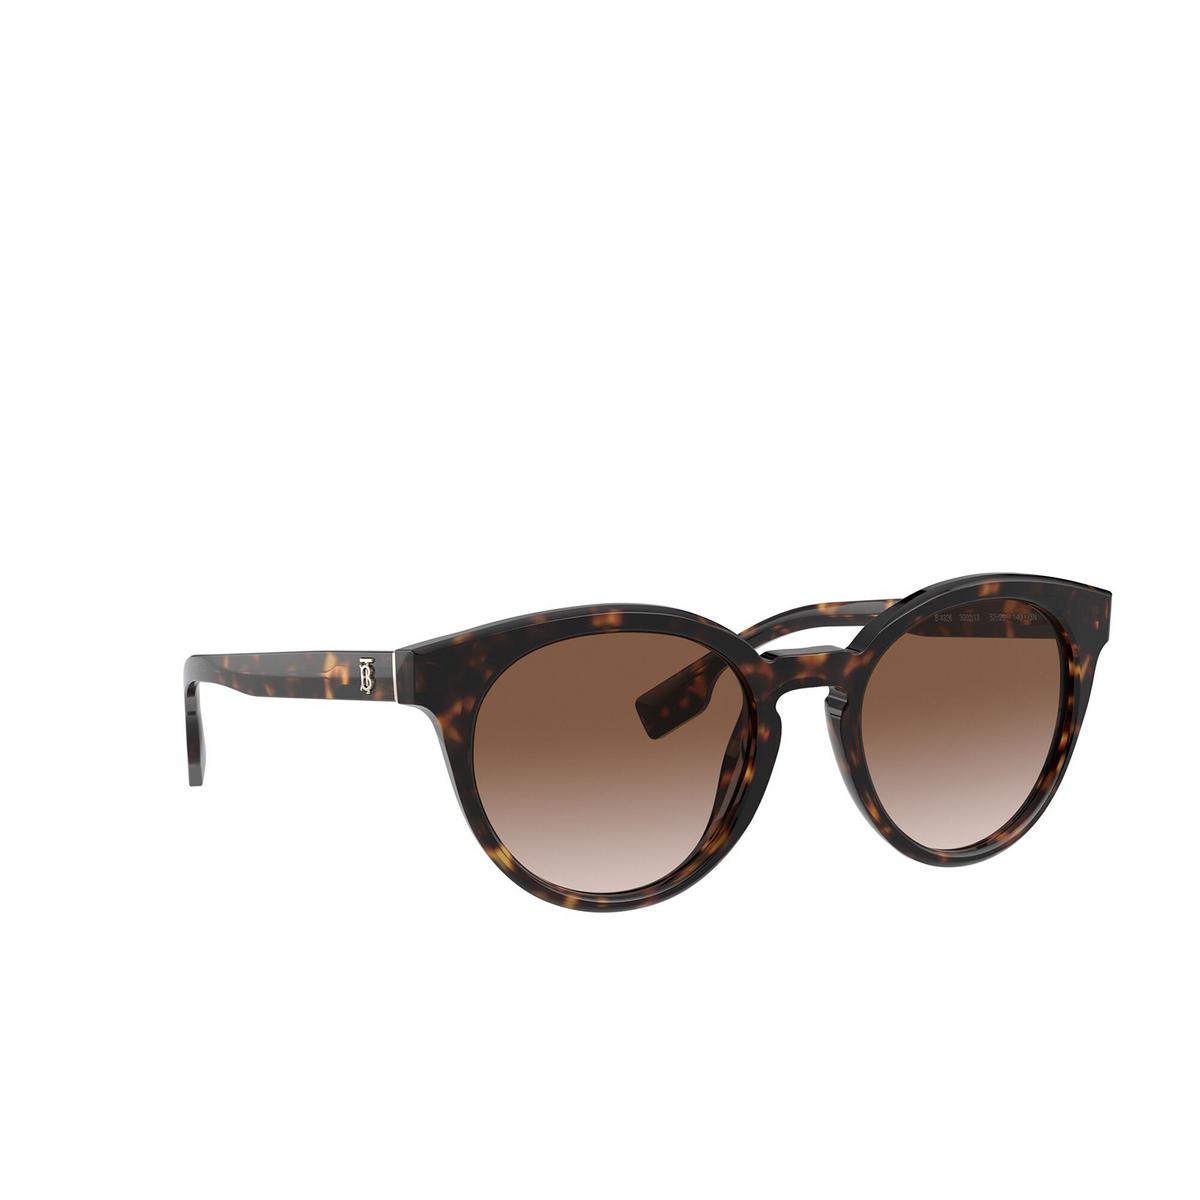 Burberry® Round Sunglasses: Amelia BE4326 color Dark Havana 300213 - three-quarters view.